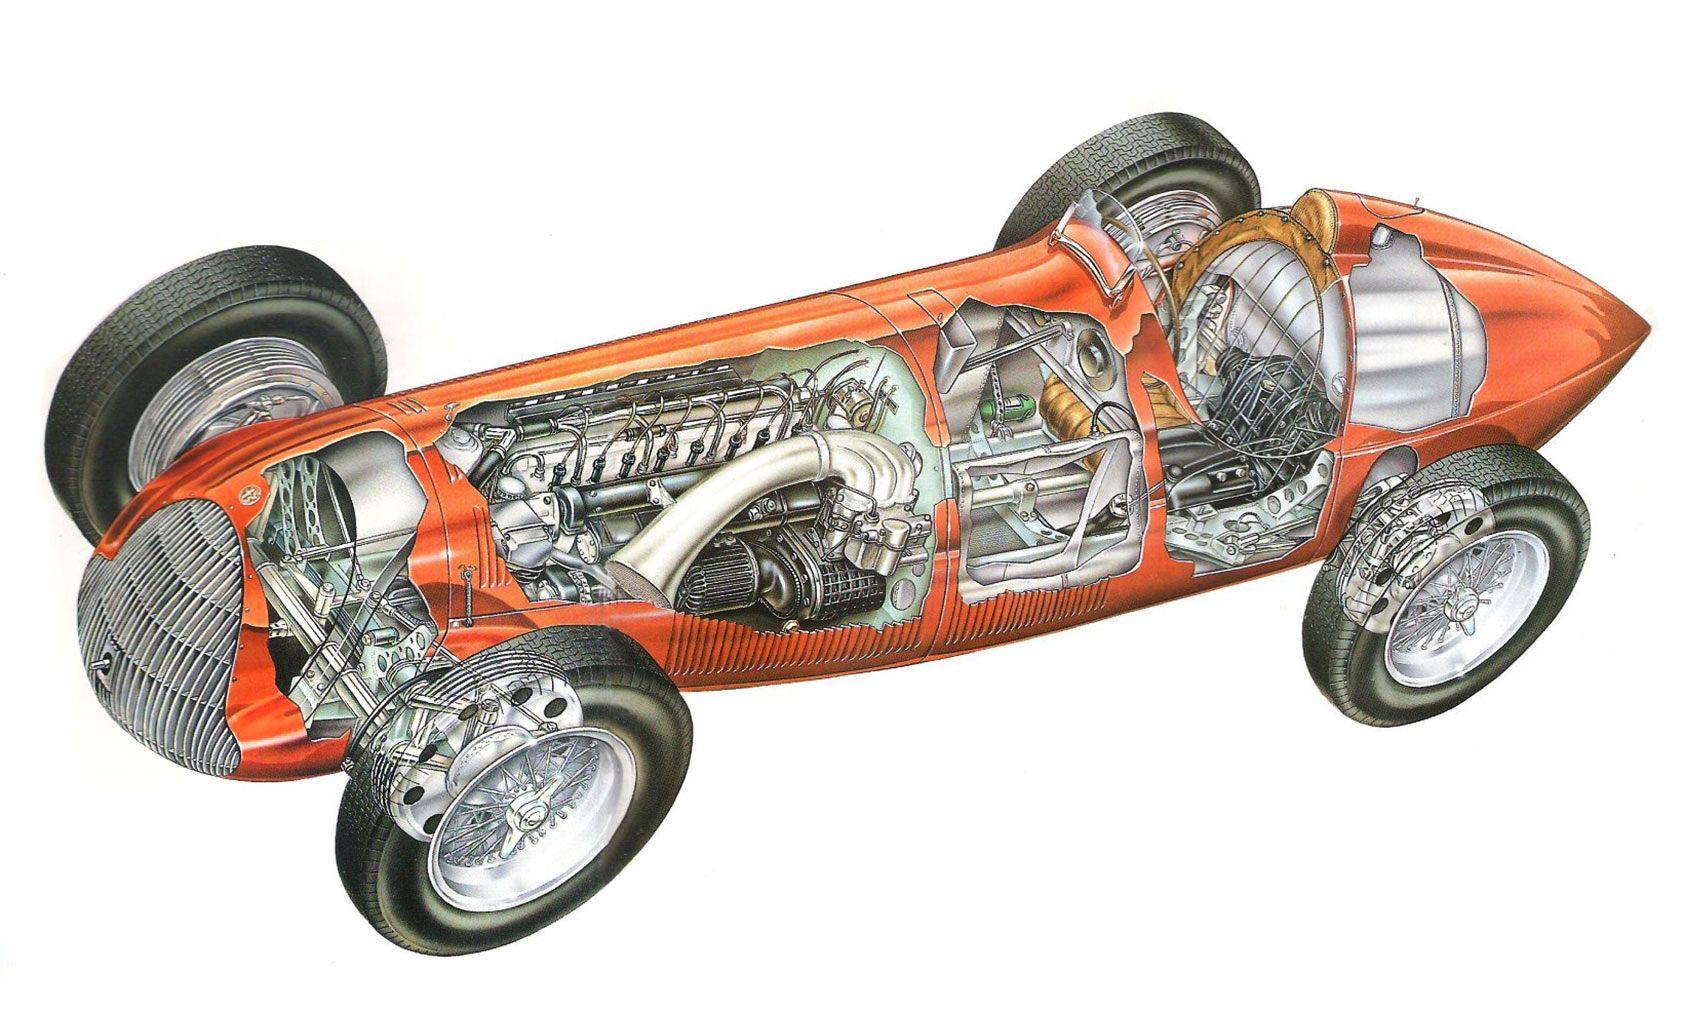 Alfa Romeo 158 cutaway drawing